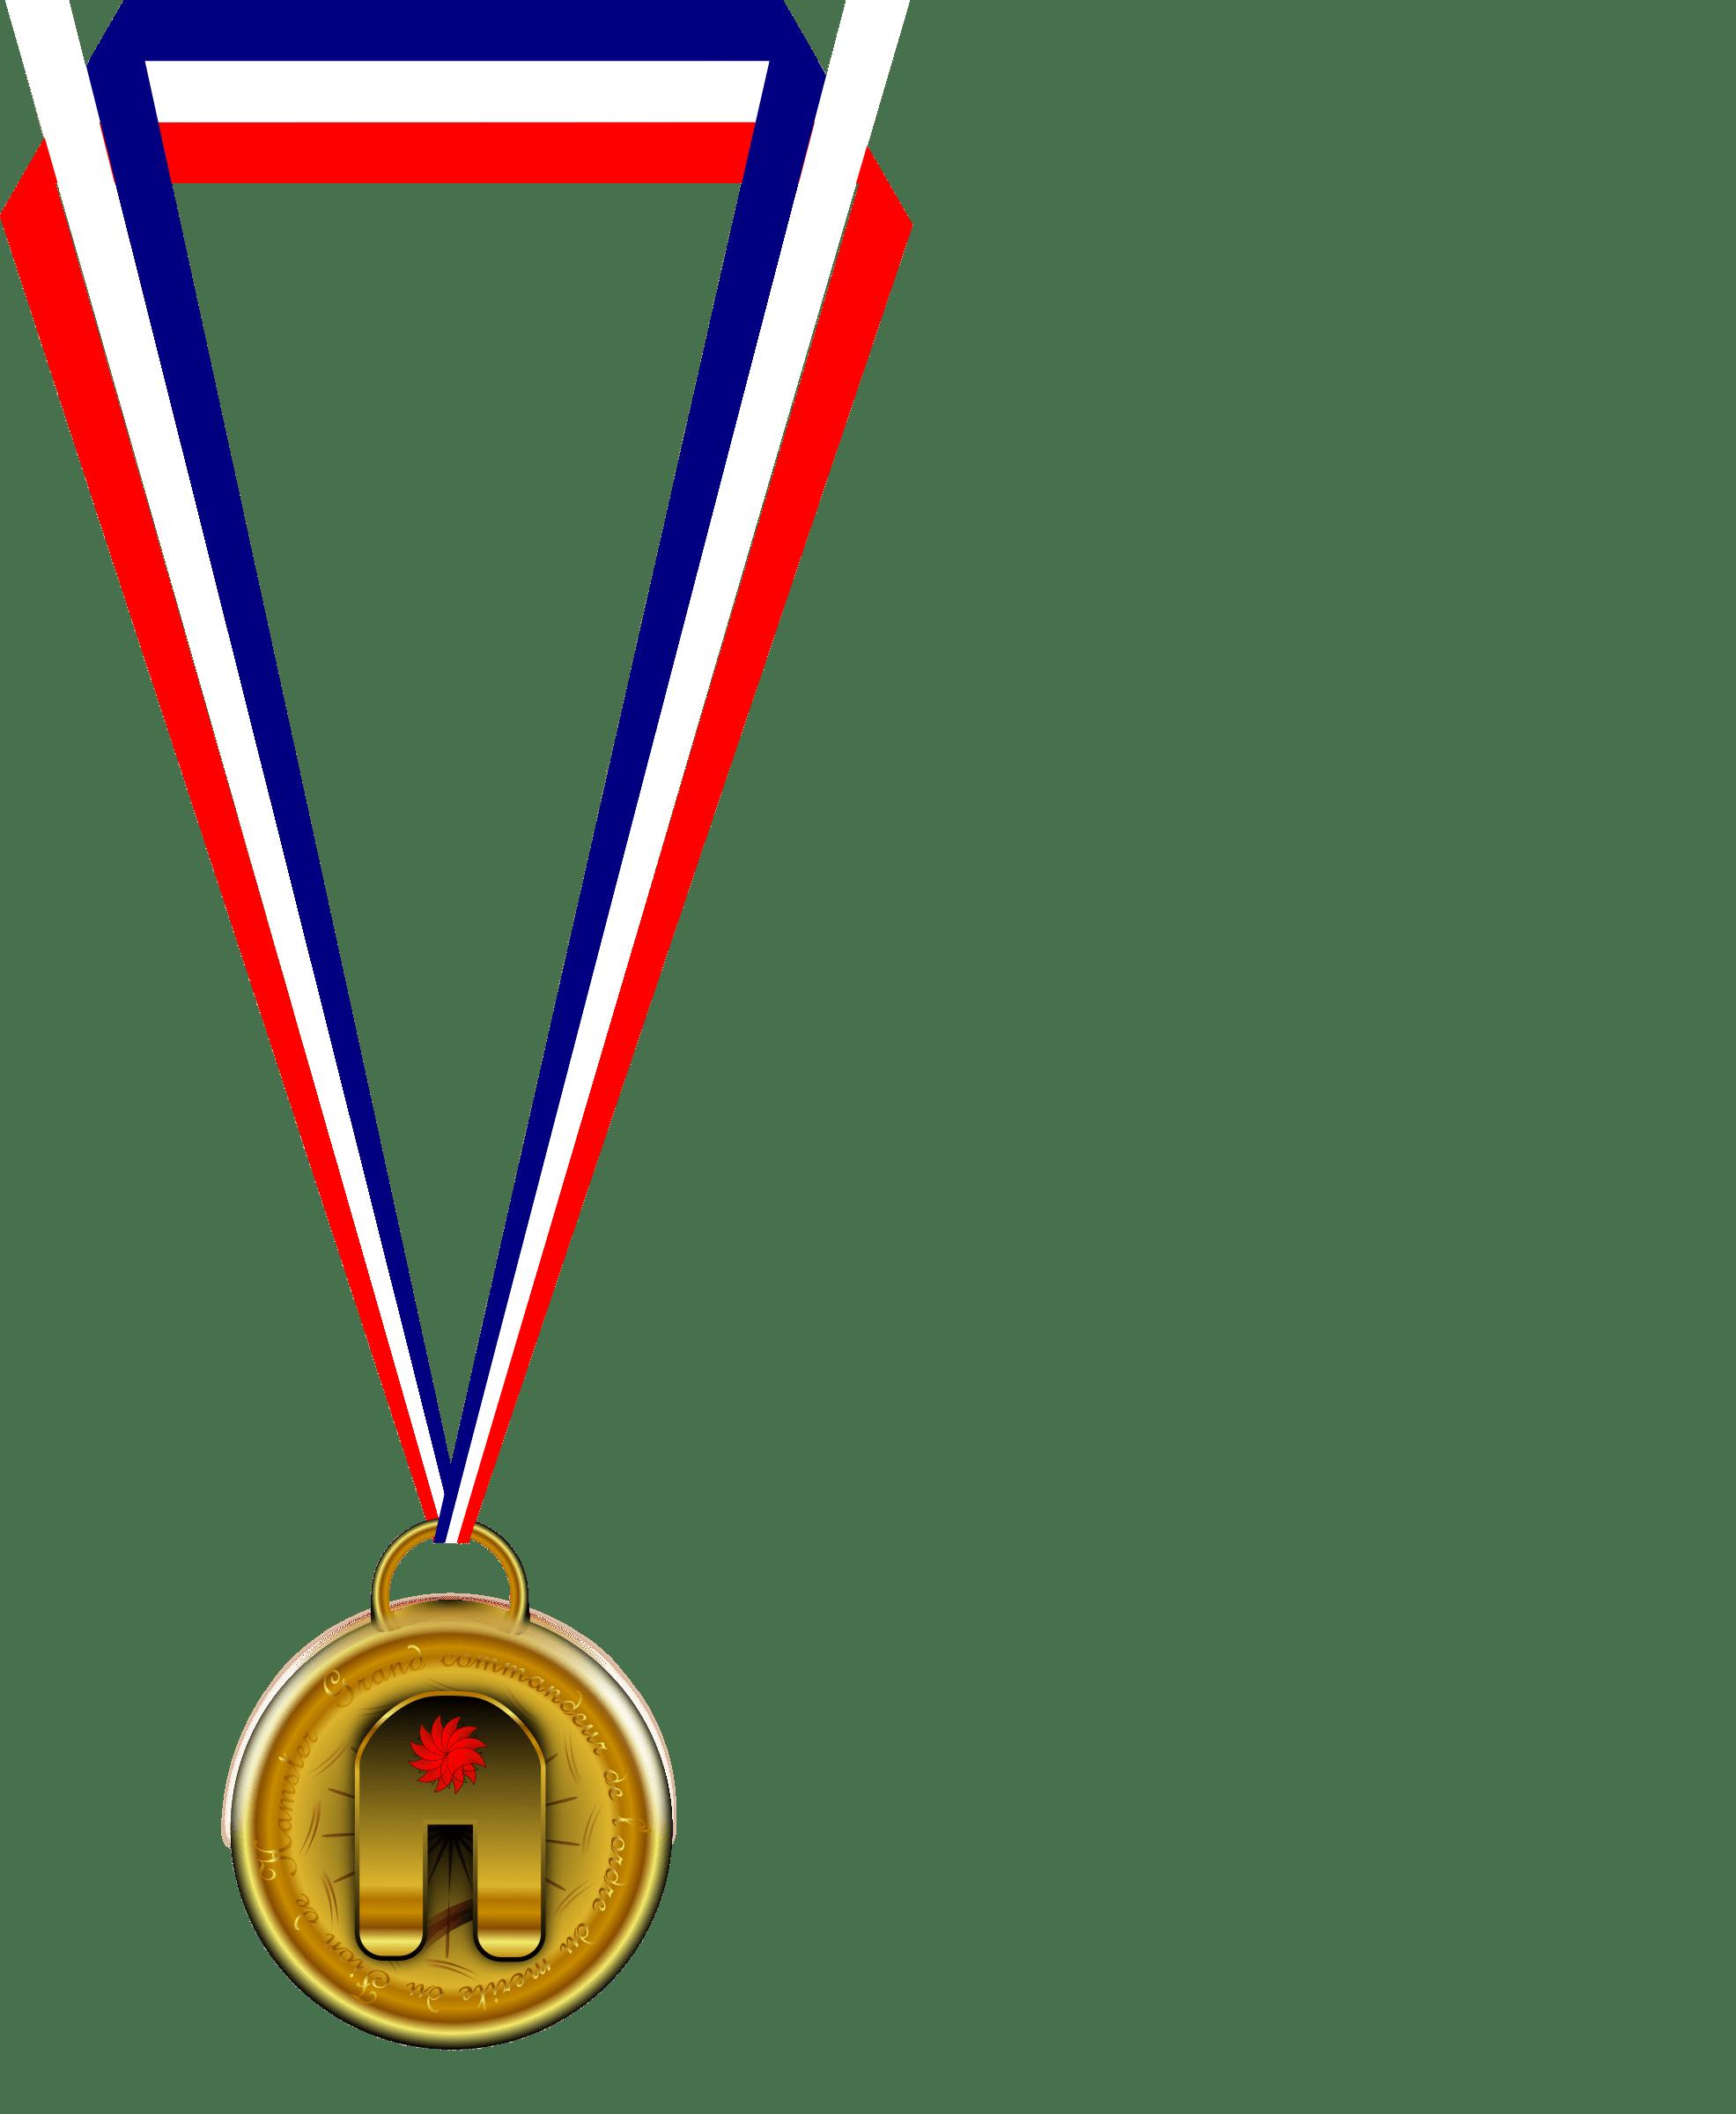 Medaillen clipart stock Clipart medaillen » Clipart Portal stock